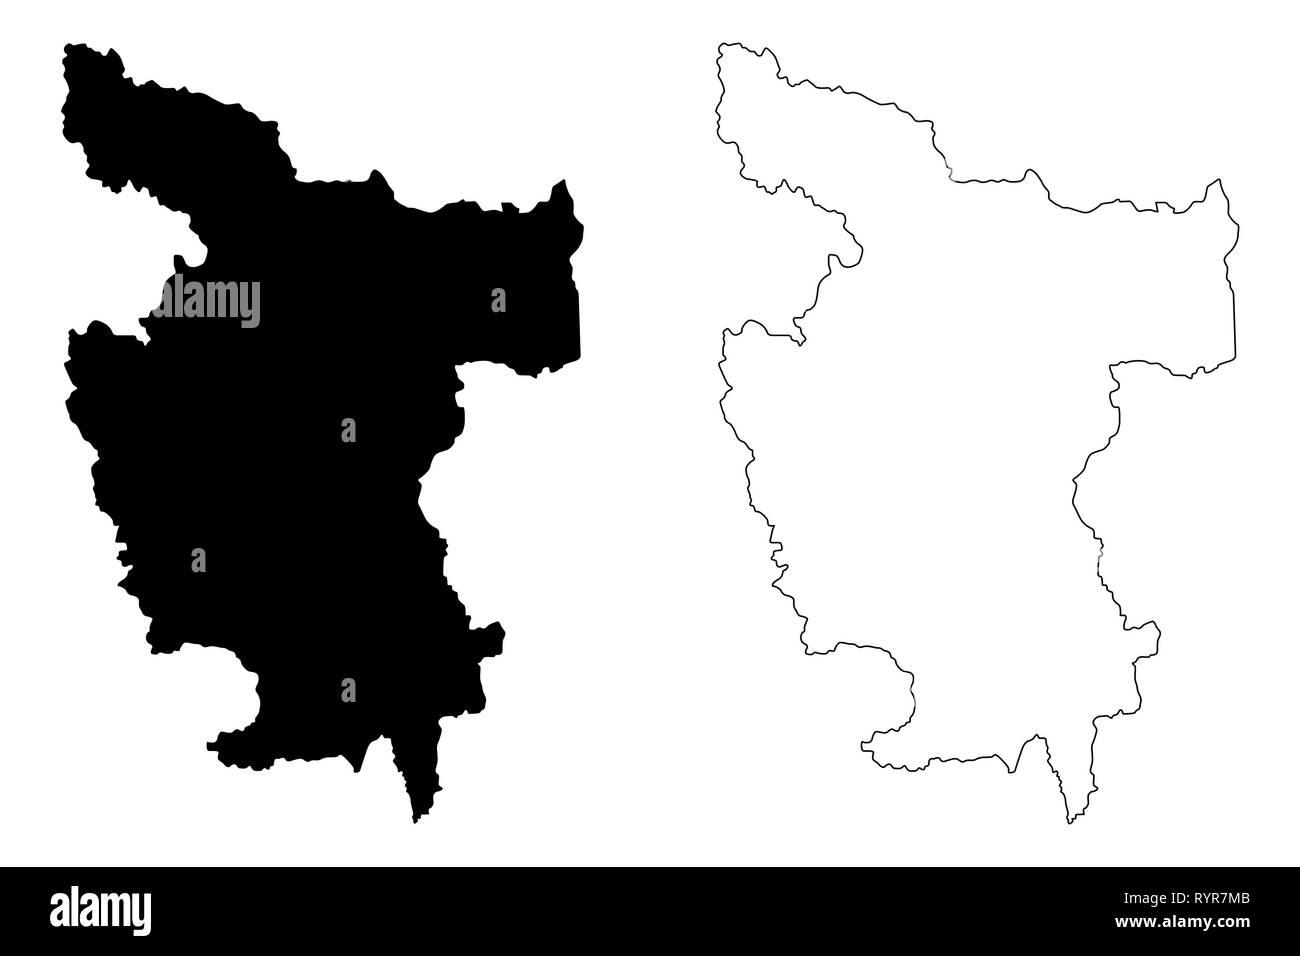 Department of San Martin (Republic of Peru, Regions of Peru) map vector illustration, scribble sketch San Martin map - Stock Vector